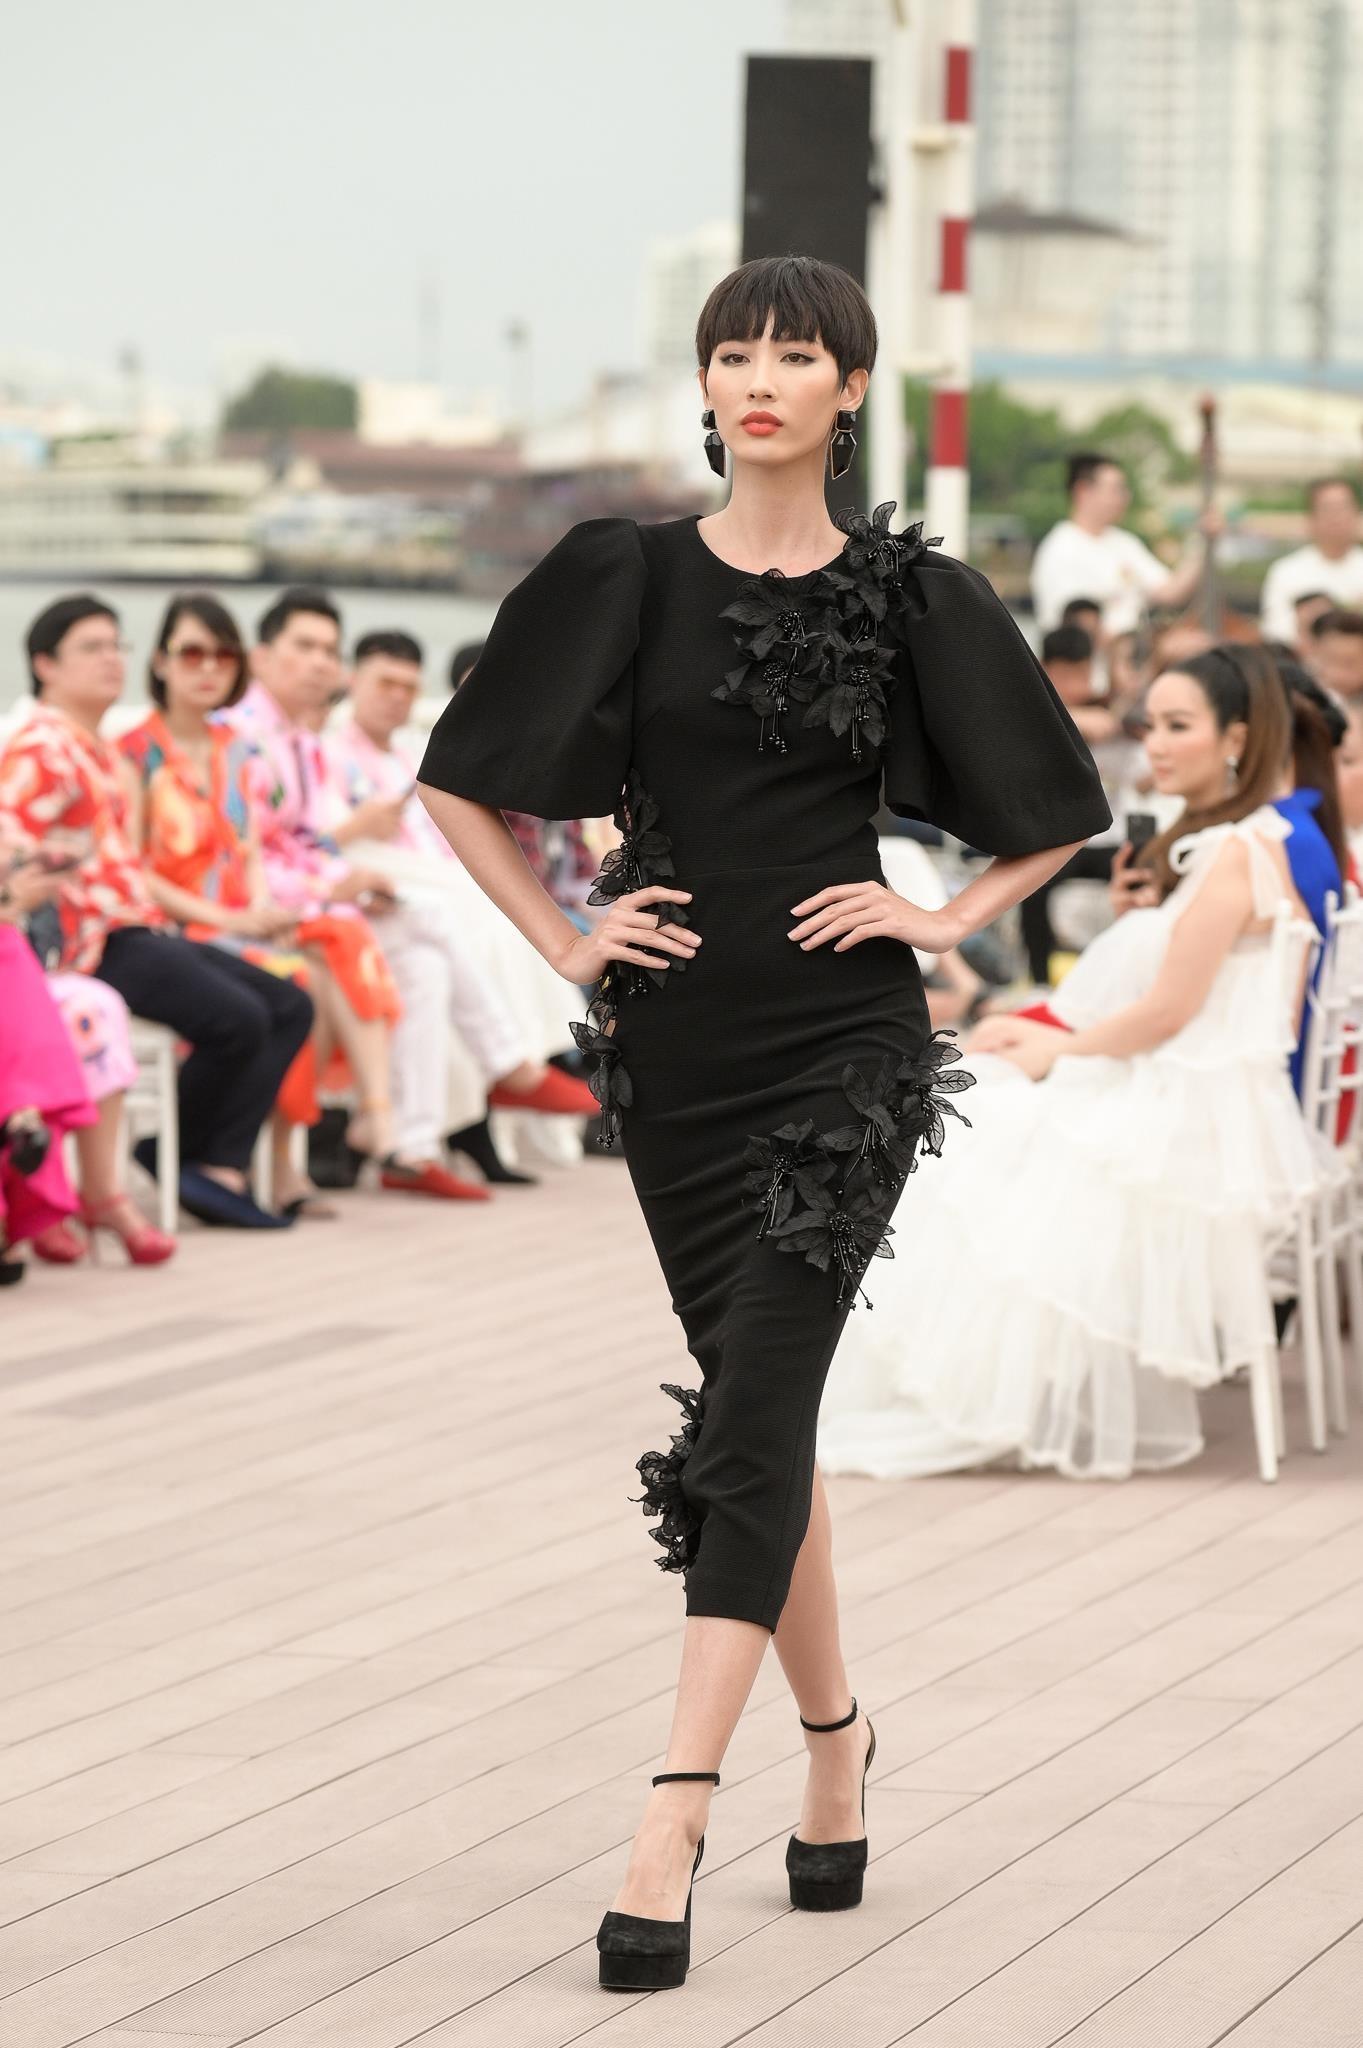 Thanh Hang 'dung do' Vo Hoang Yen tren san dien sau cang thang hinh anh 8